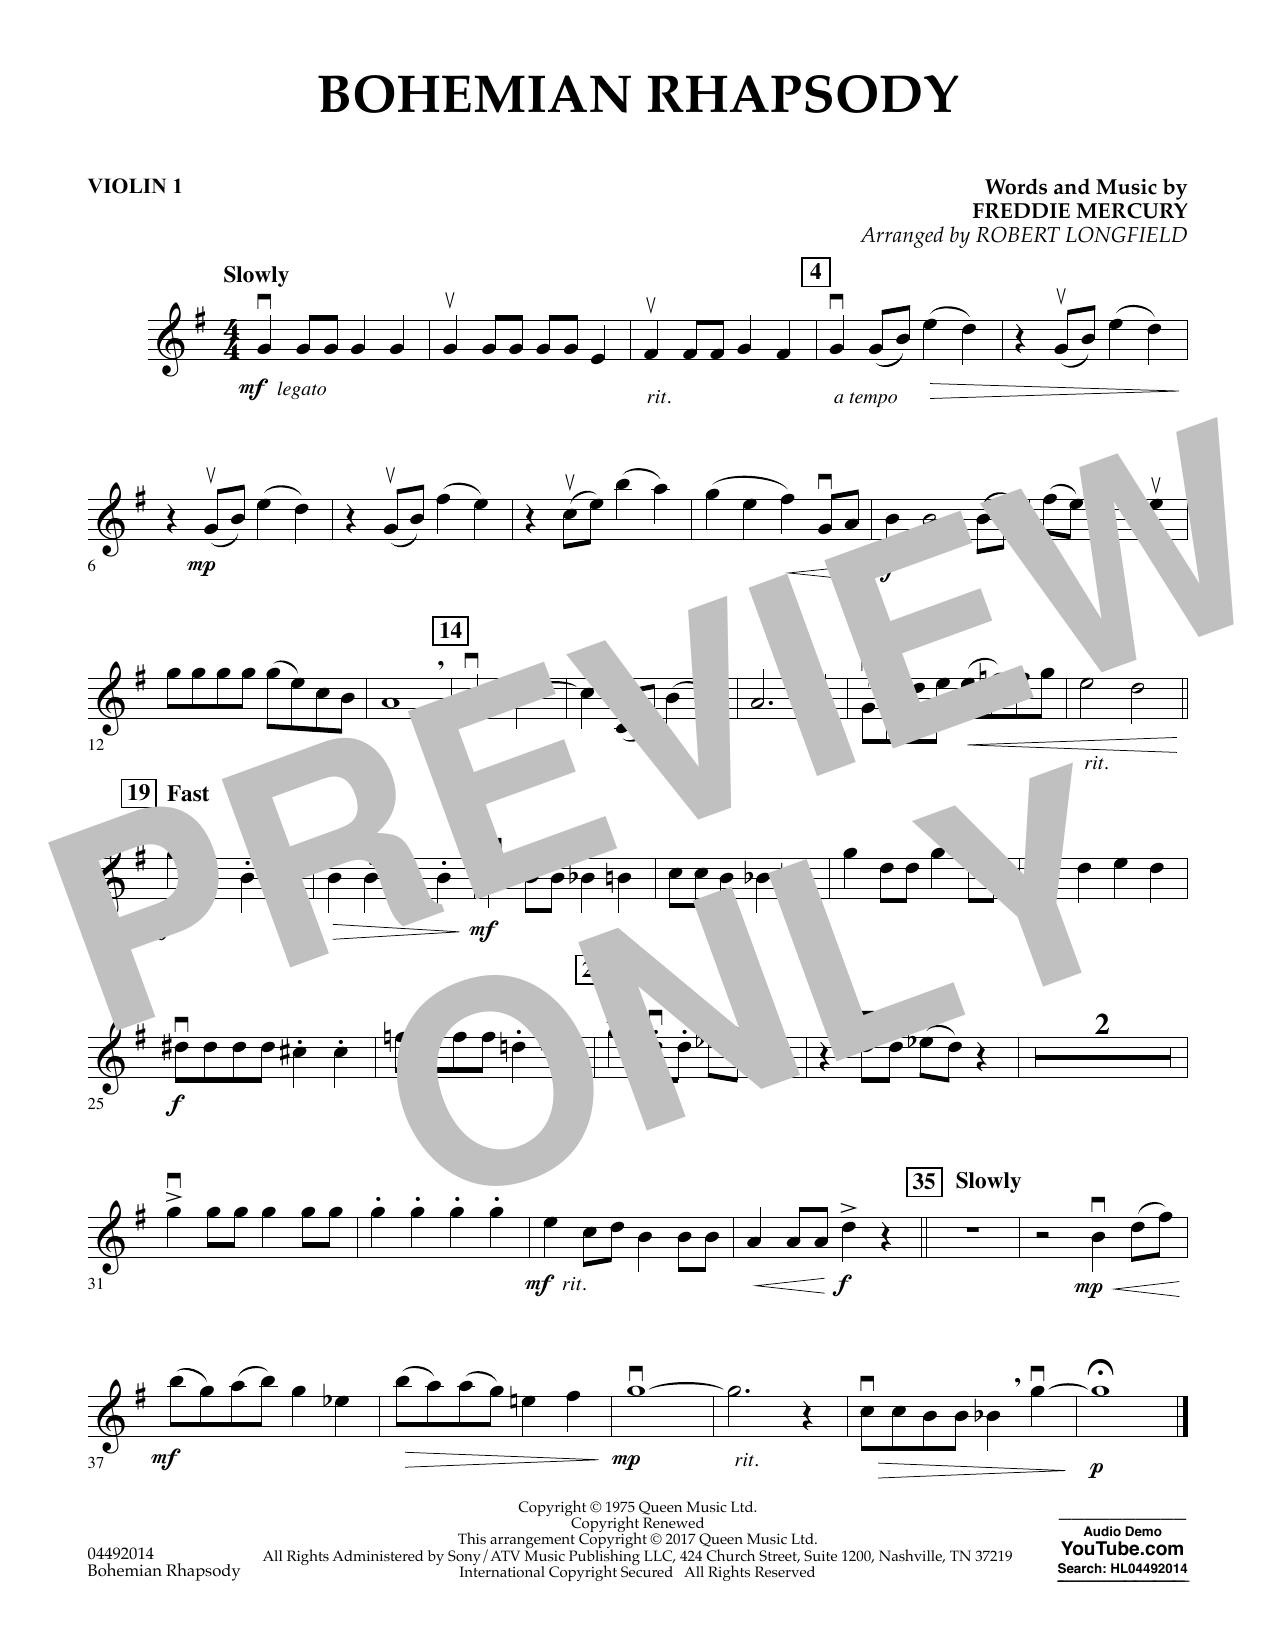 Robert Longfield Bohemian Rhapsody - Violin 1 sheet music notes and chords. Download Printable PDF.